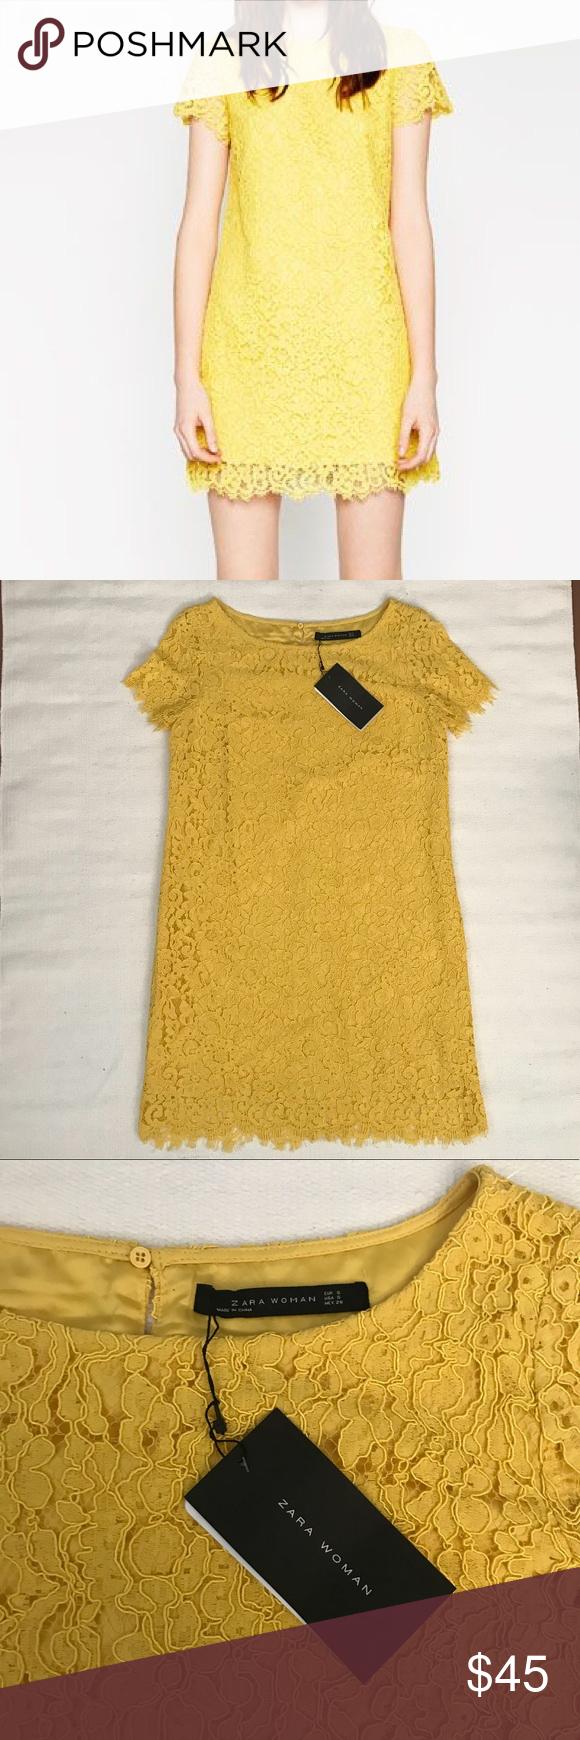 967a62baf75ae7 NWT ZARA YELLOW LACE DRESS New with Tags Sunny yellow Zara women's  Beautiful lace Perfect Easter Dress Zara Dresses